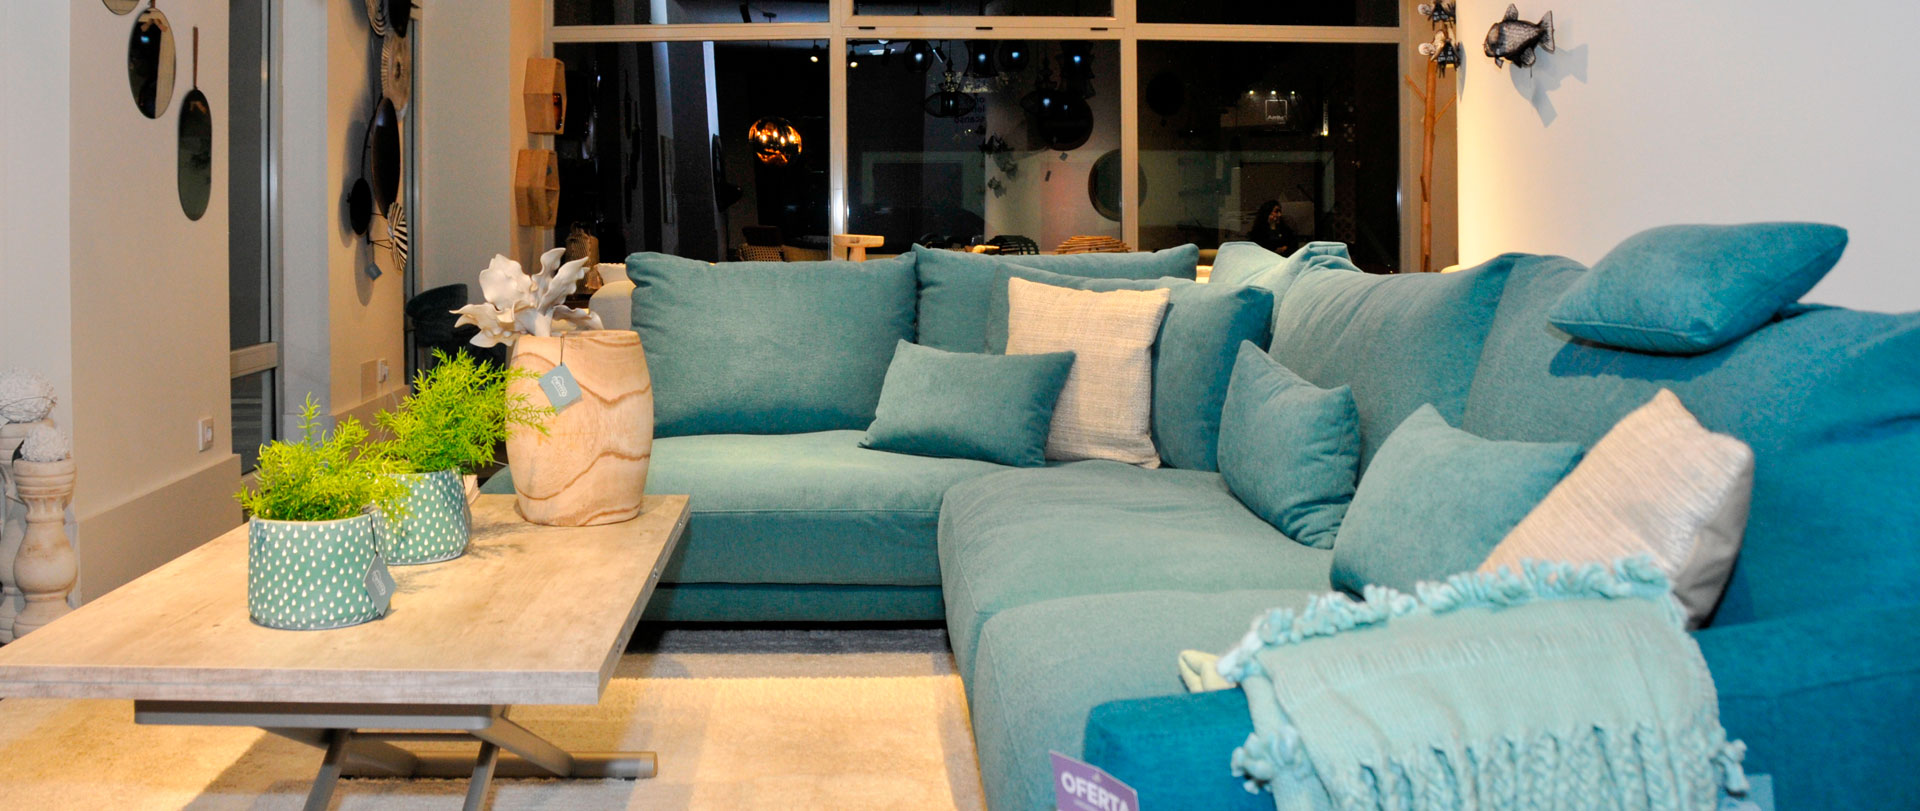 sofá mimma gallery